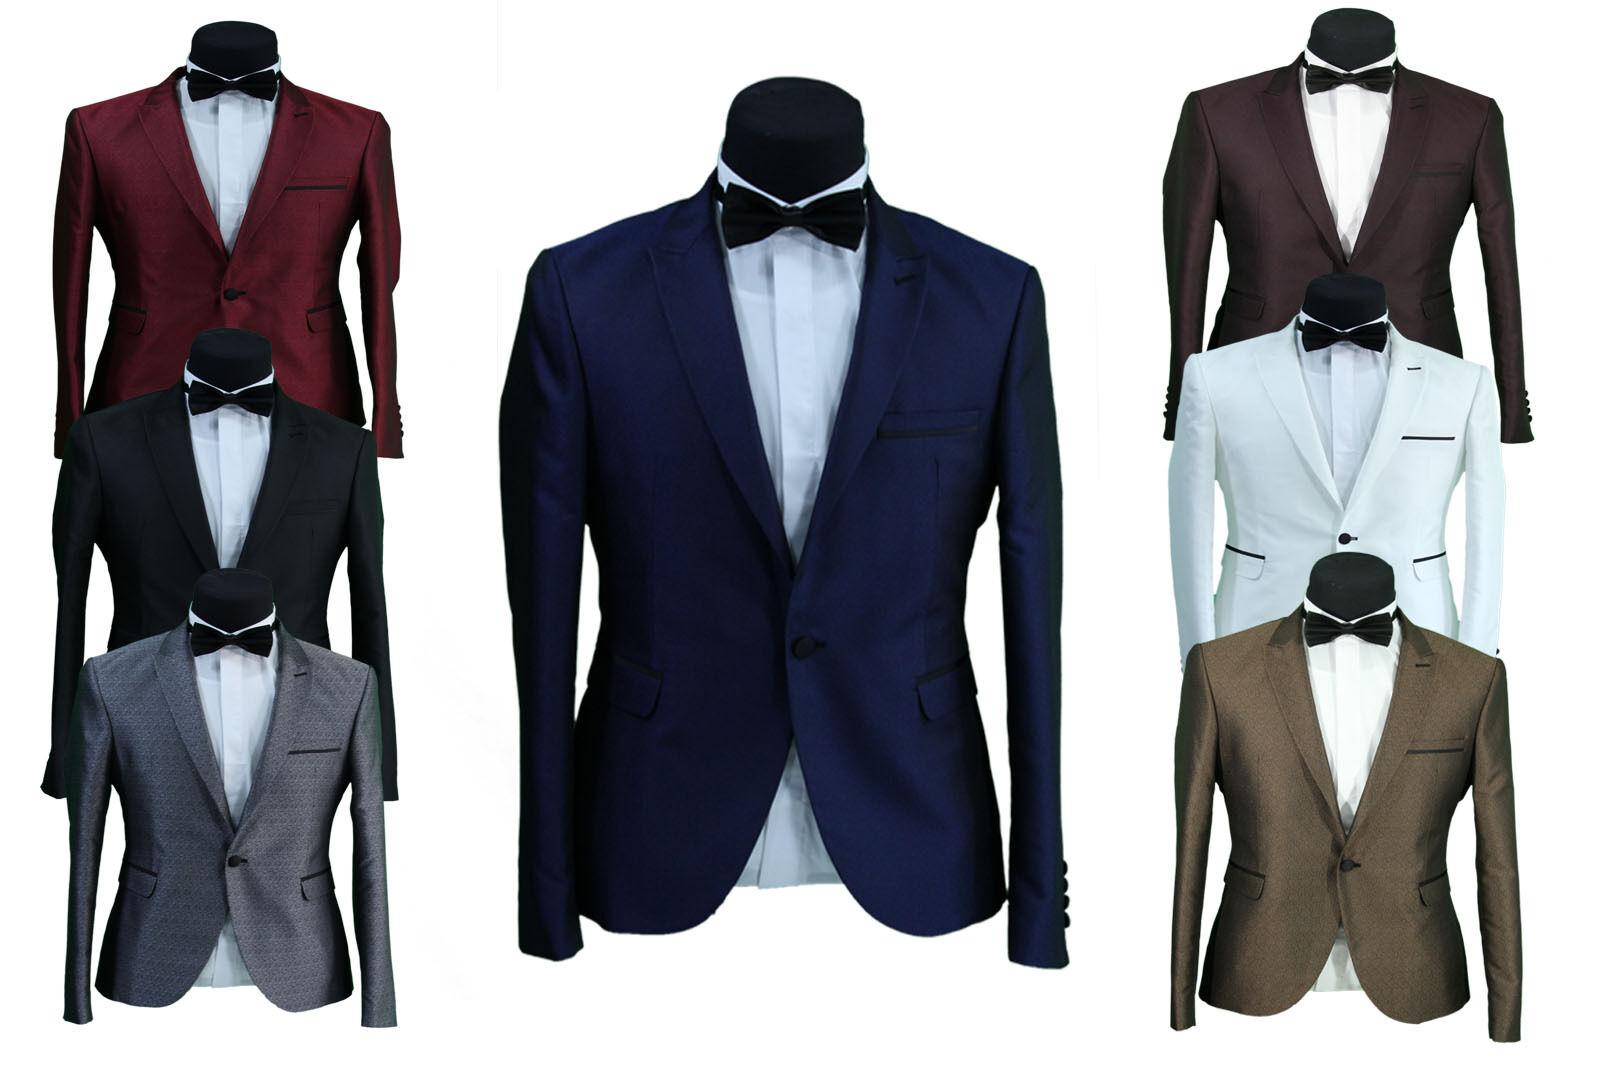 Slim Sakko in Blau•Bordeaux•Creme•Gold•Rot•Schwarz•Silber•Weiss - Anzug Smoking